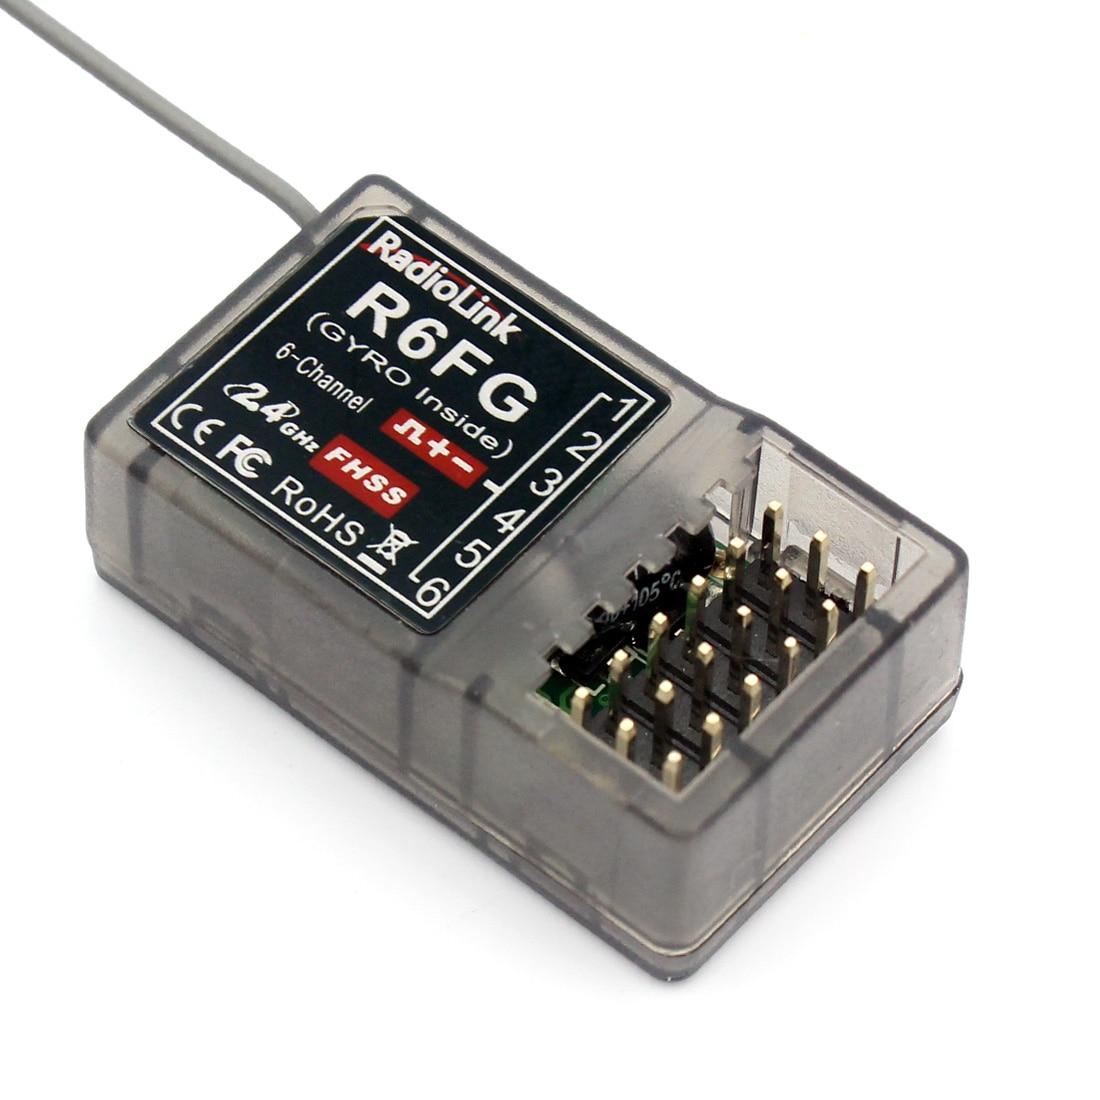 Radiolink R6FG 2.4GHz 6 Channel FHSS Receiver Radio Control System Gyro Integrant For RC4GS RC3S,RC4G T8FB Transmitter F21425